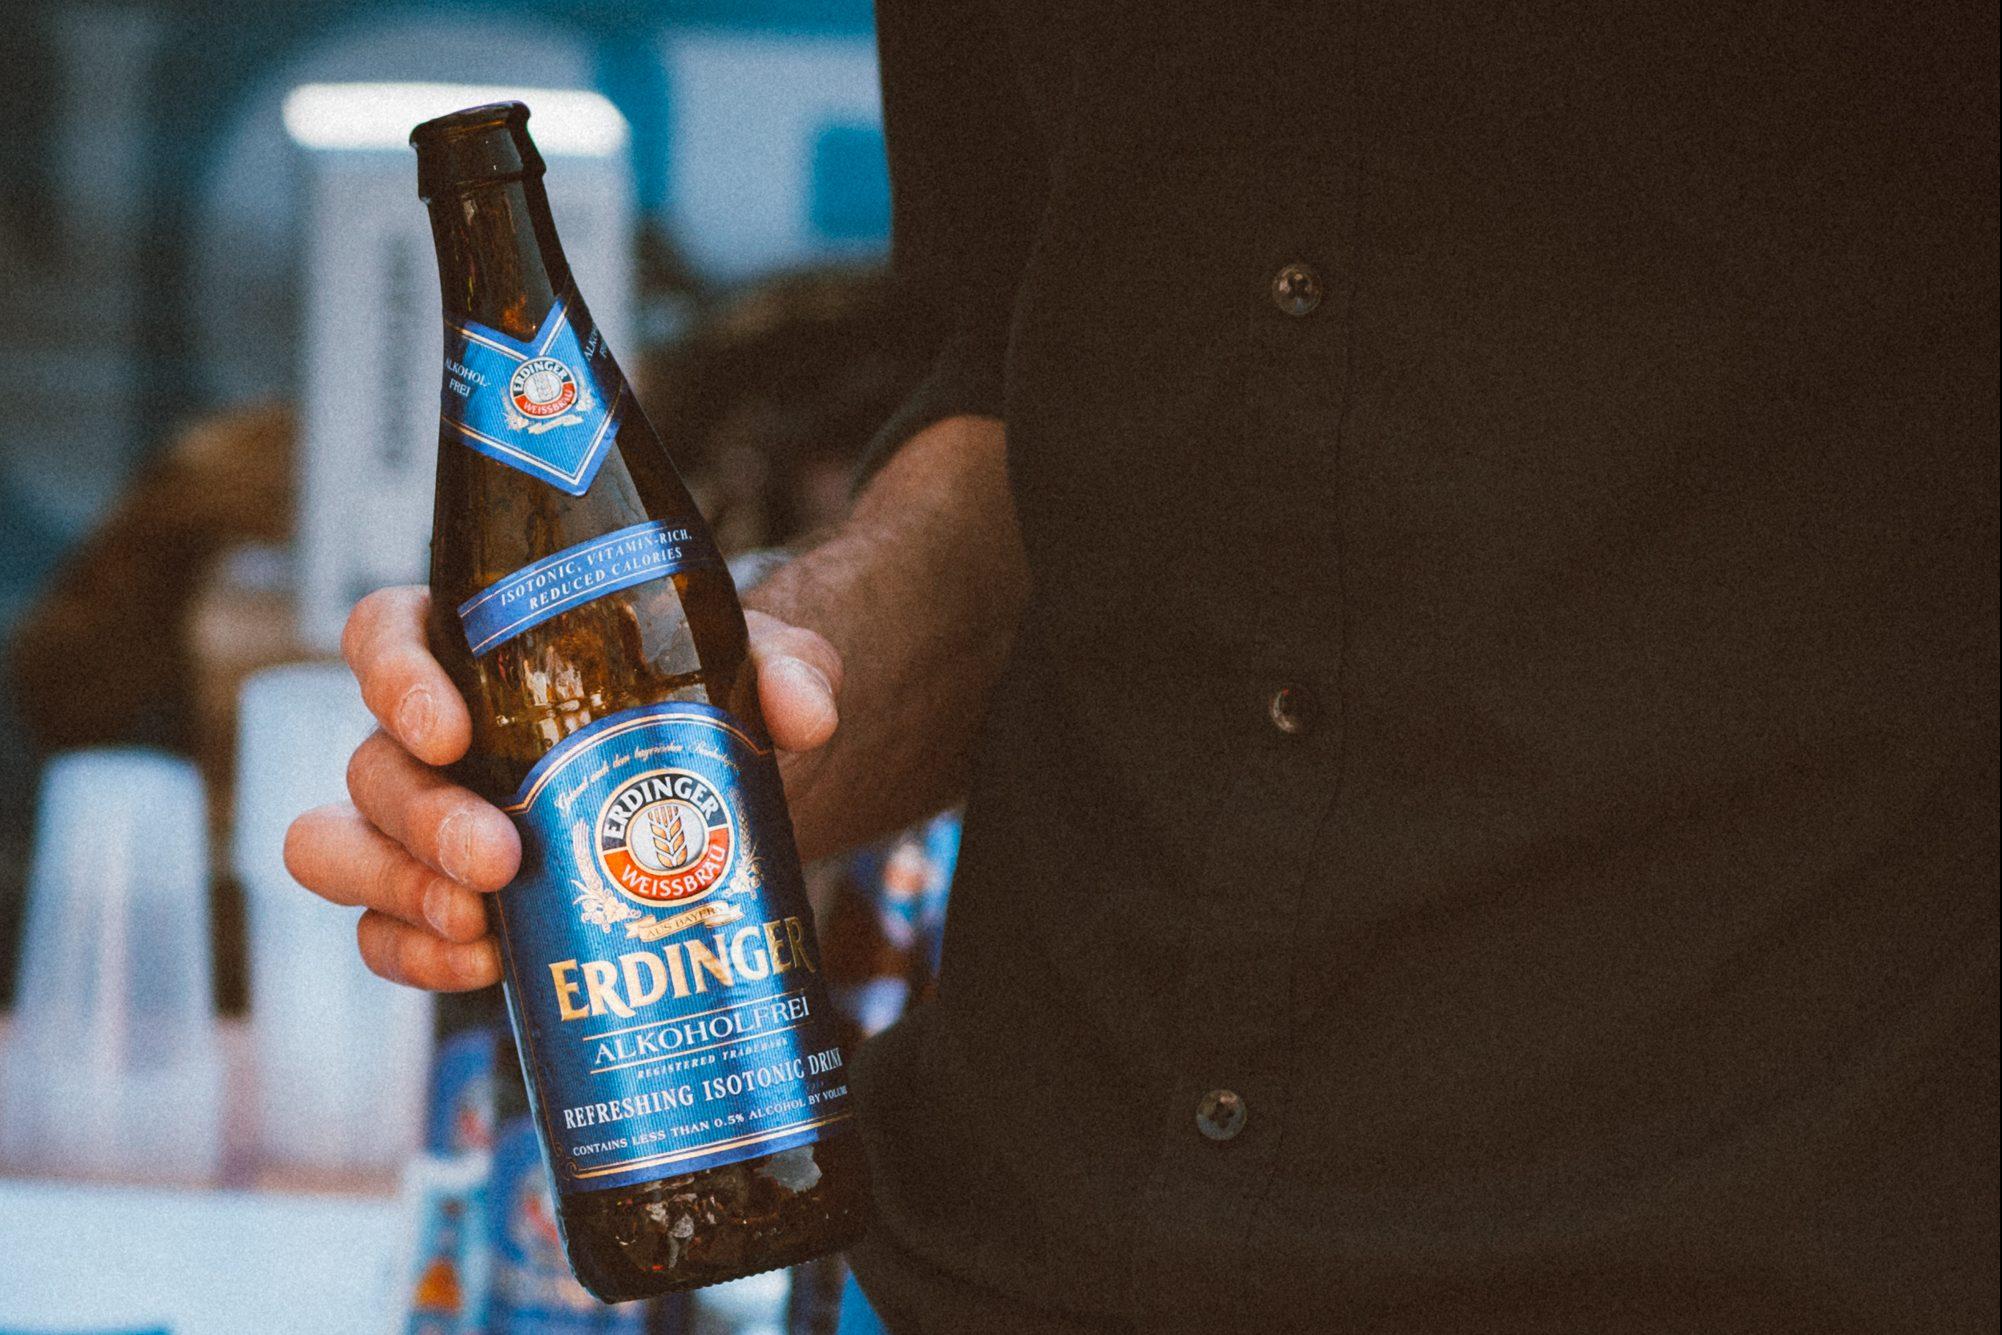 Erdinger alcohol-free beer